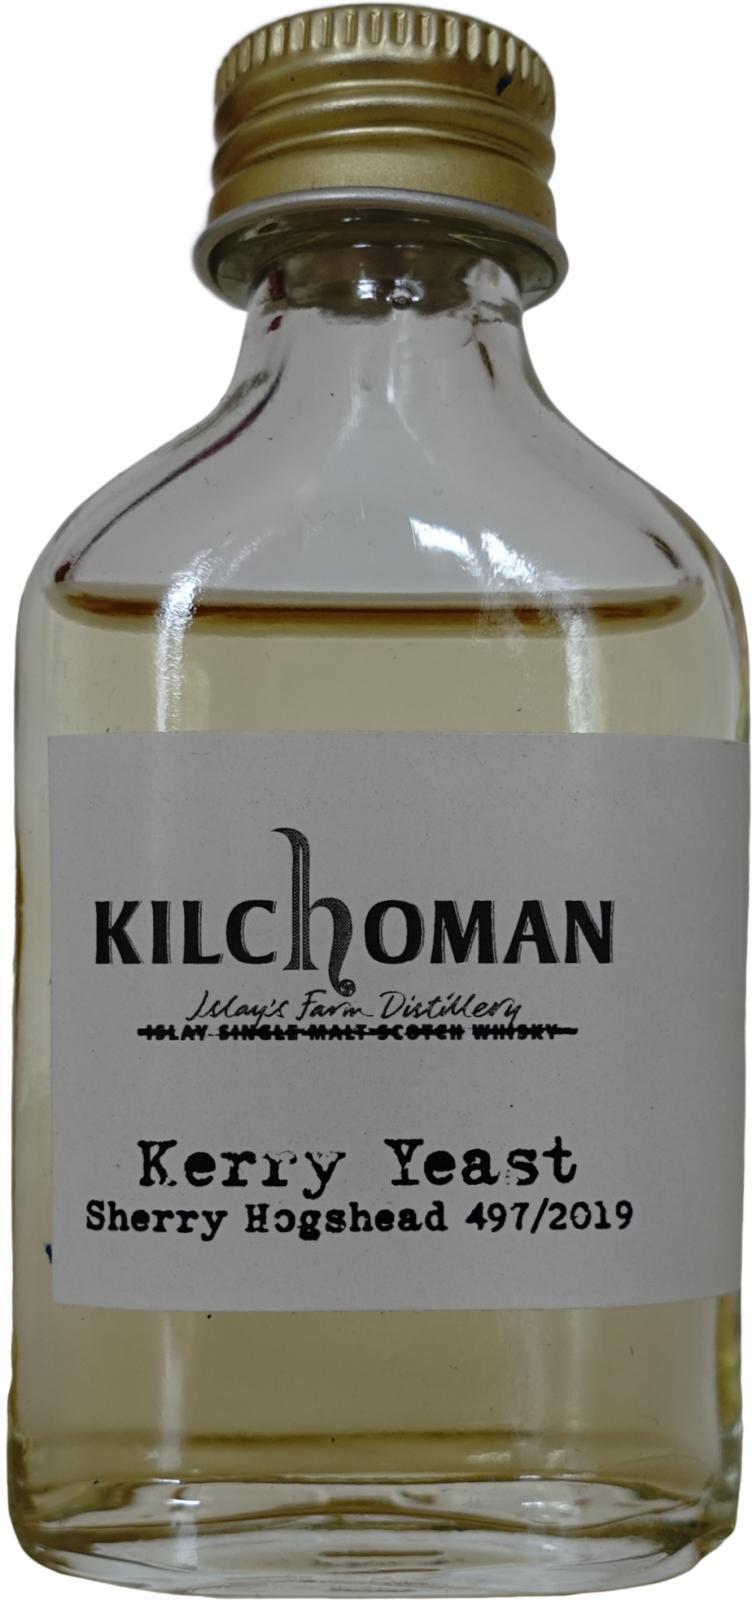 Kilchoman 2019 - Kerry Yeast